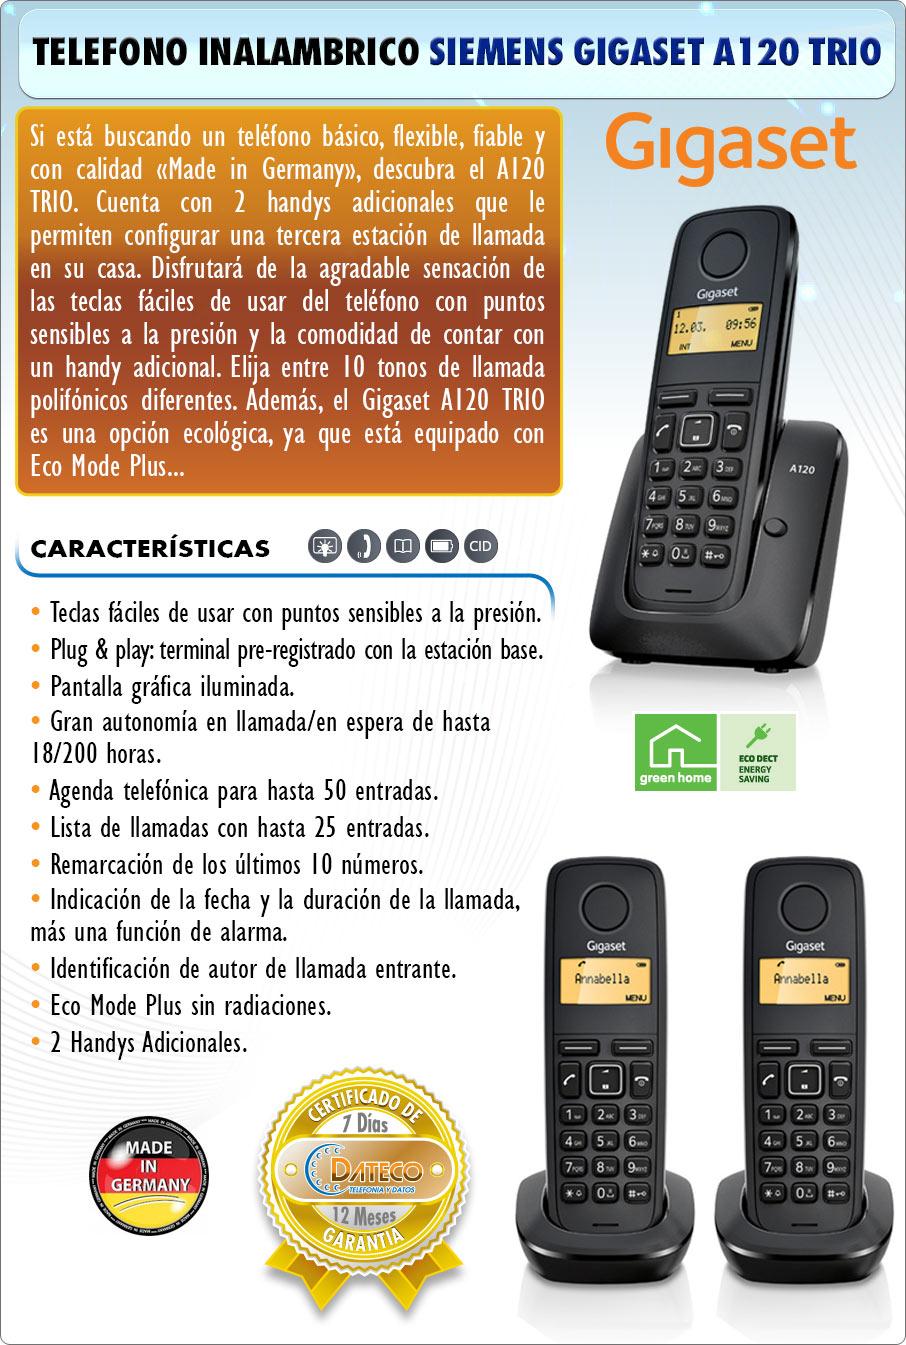 DATECO-telefonia-y-datos-telefono-inalambrico-siemens-gigaset-a120-Trio